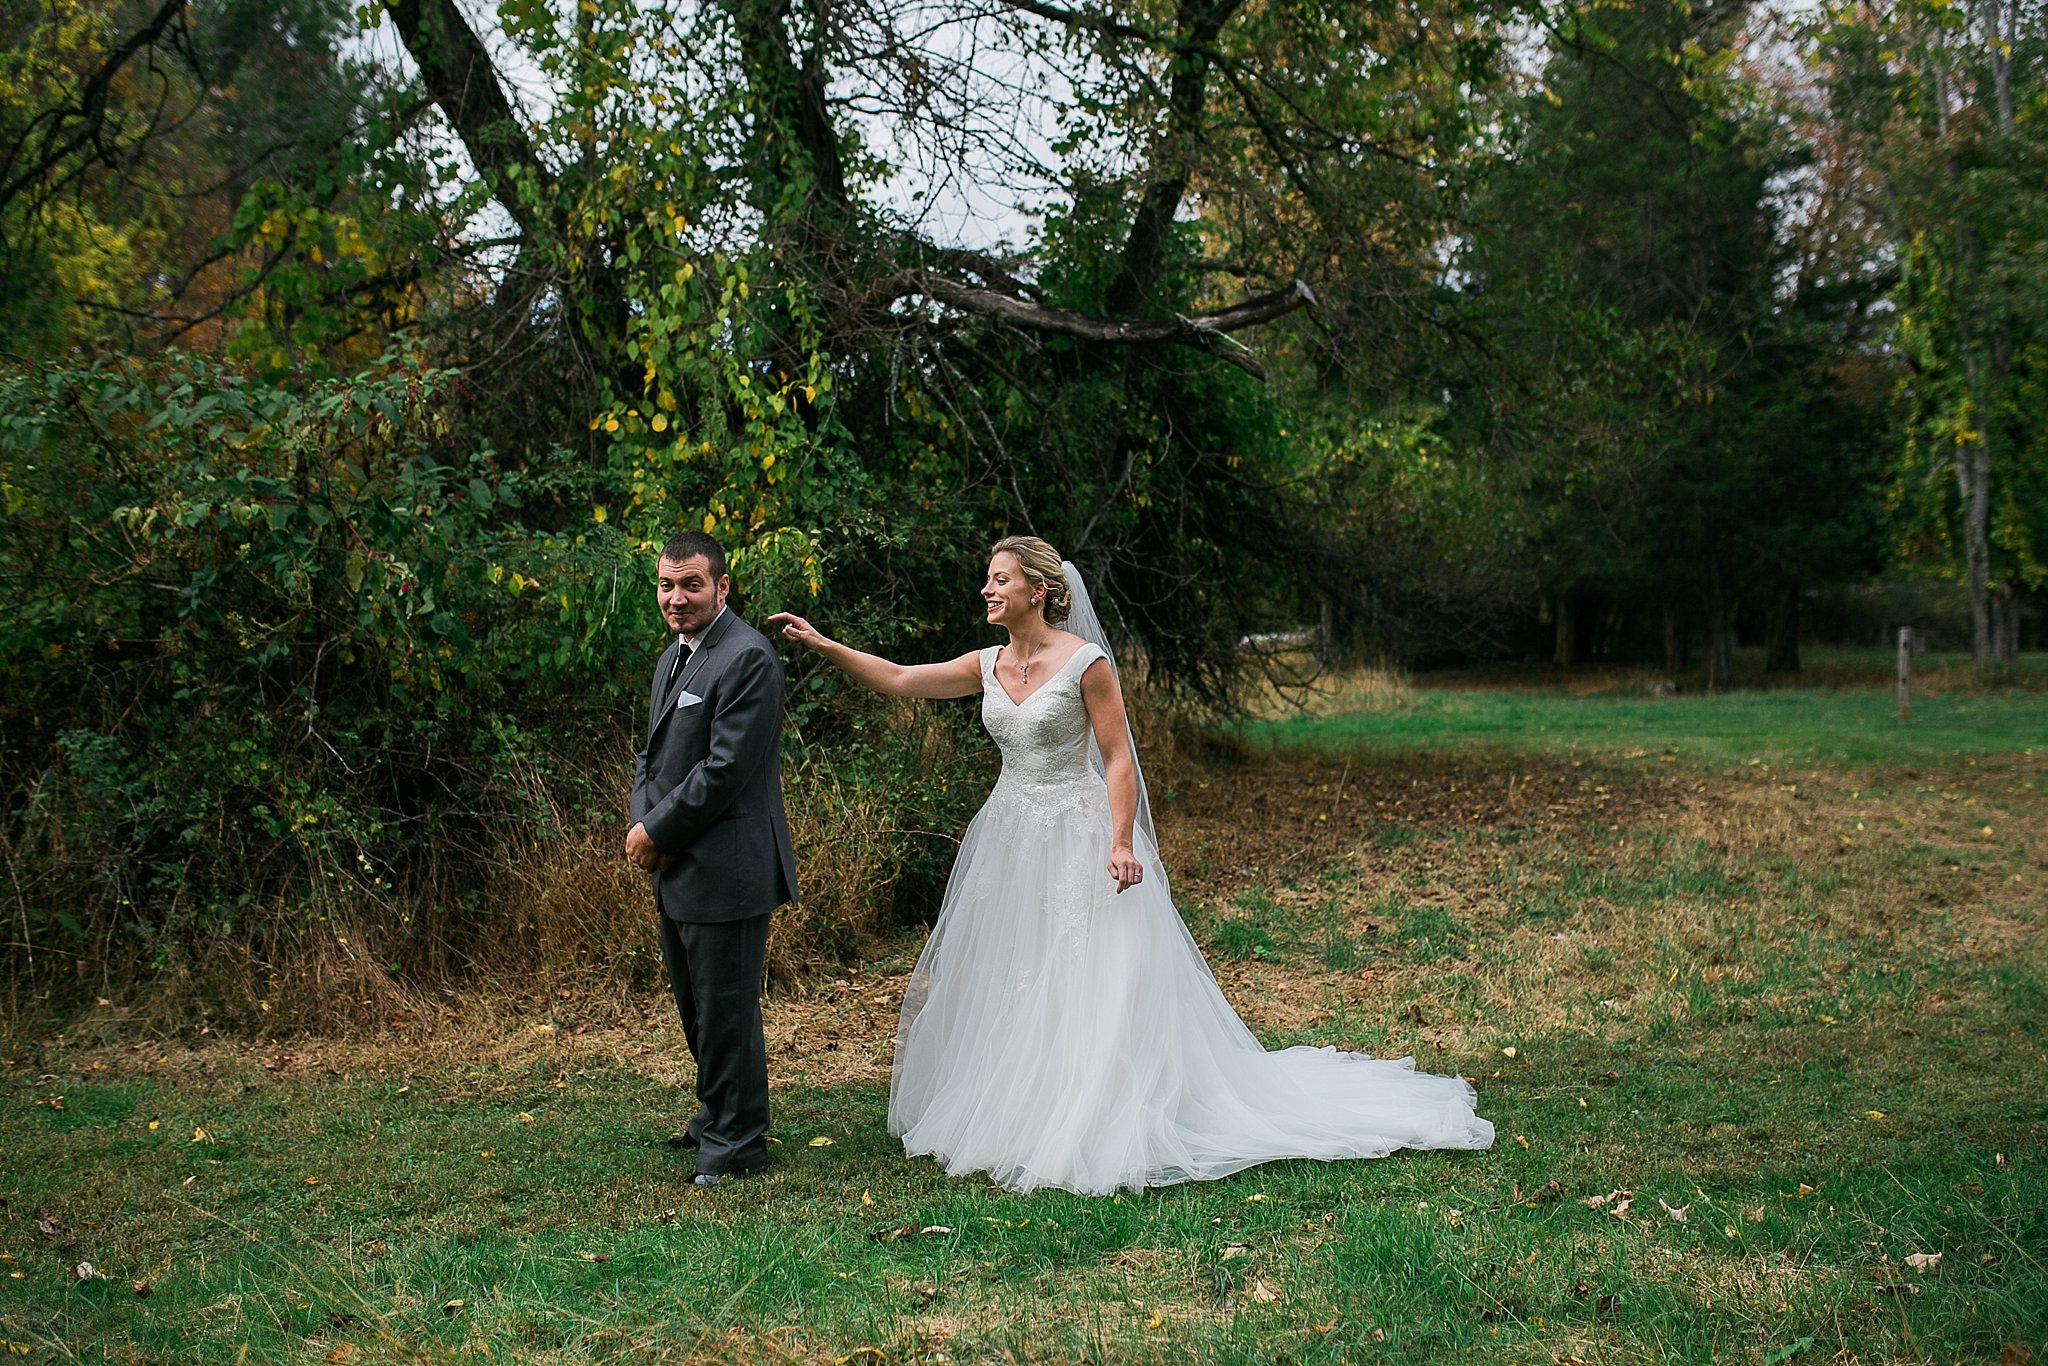 New Windsor New York Hudson Valley New York Wedding Photographer 19.jpg